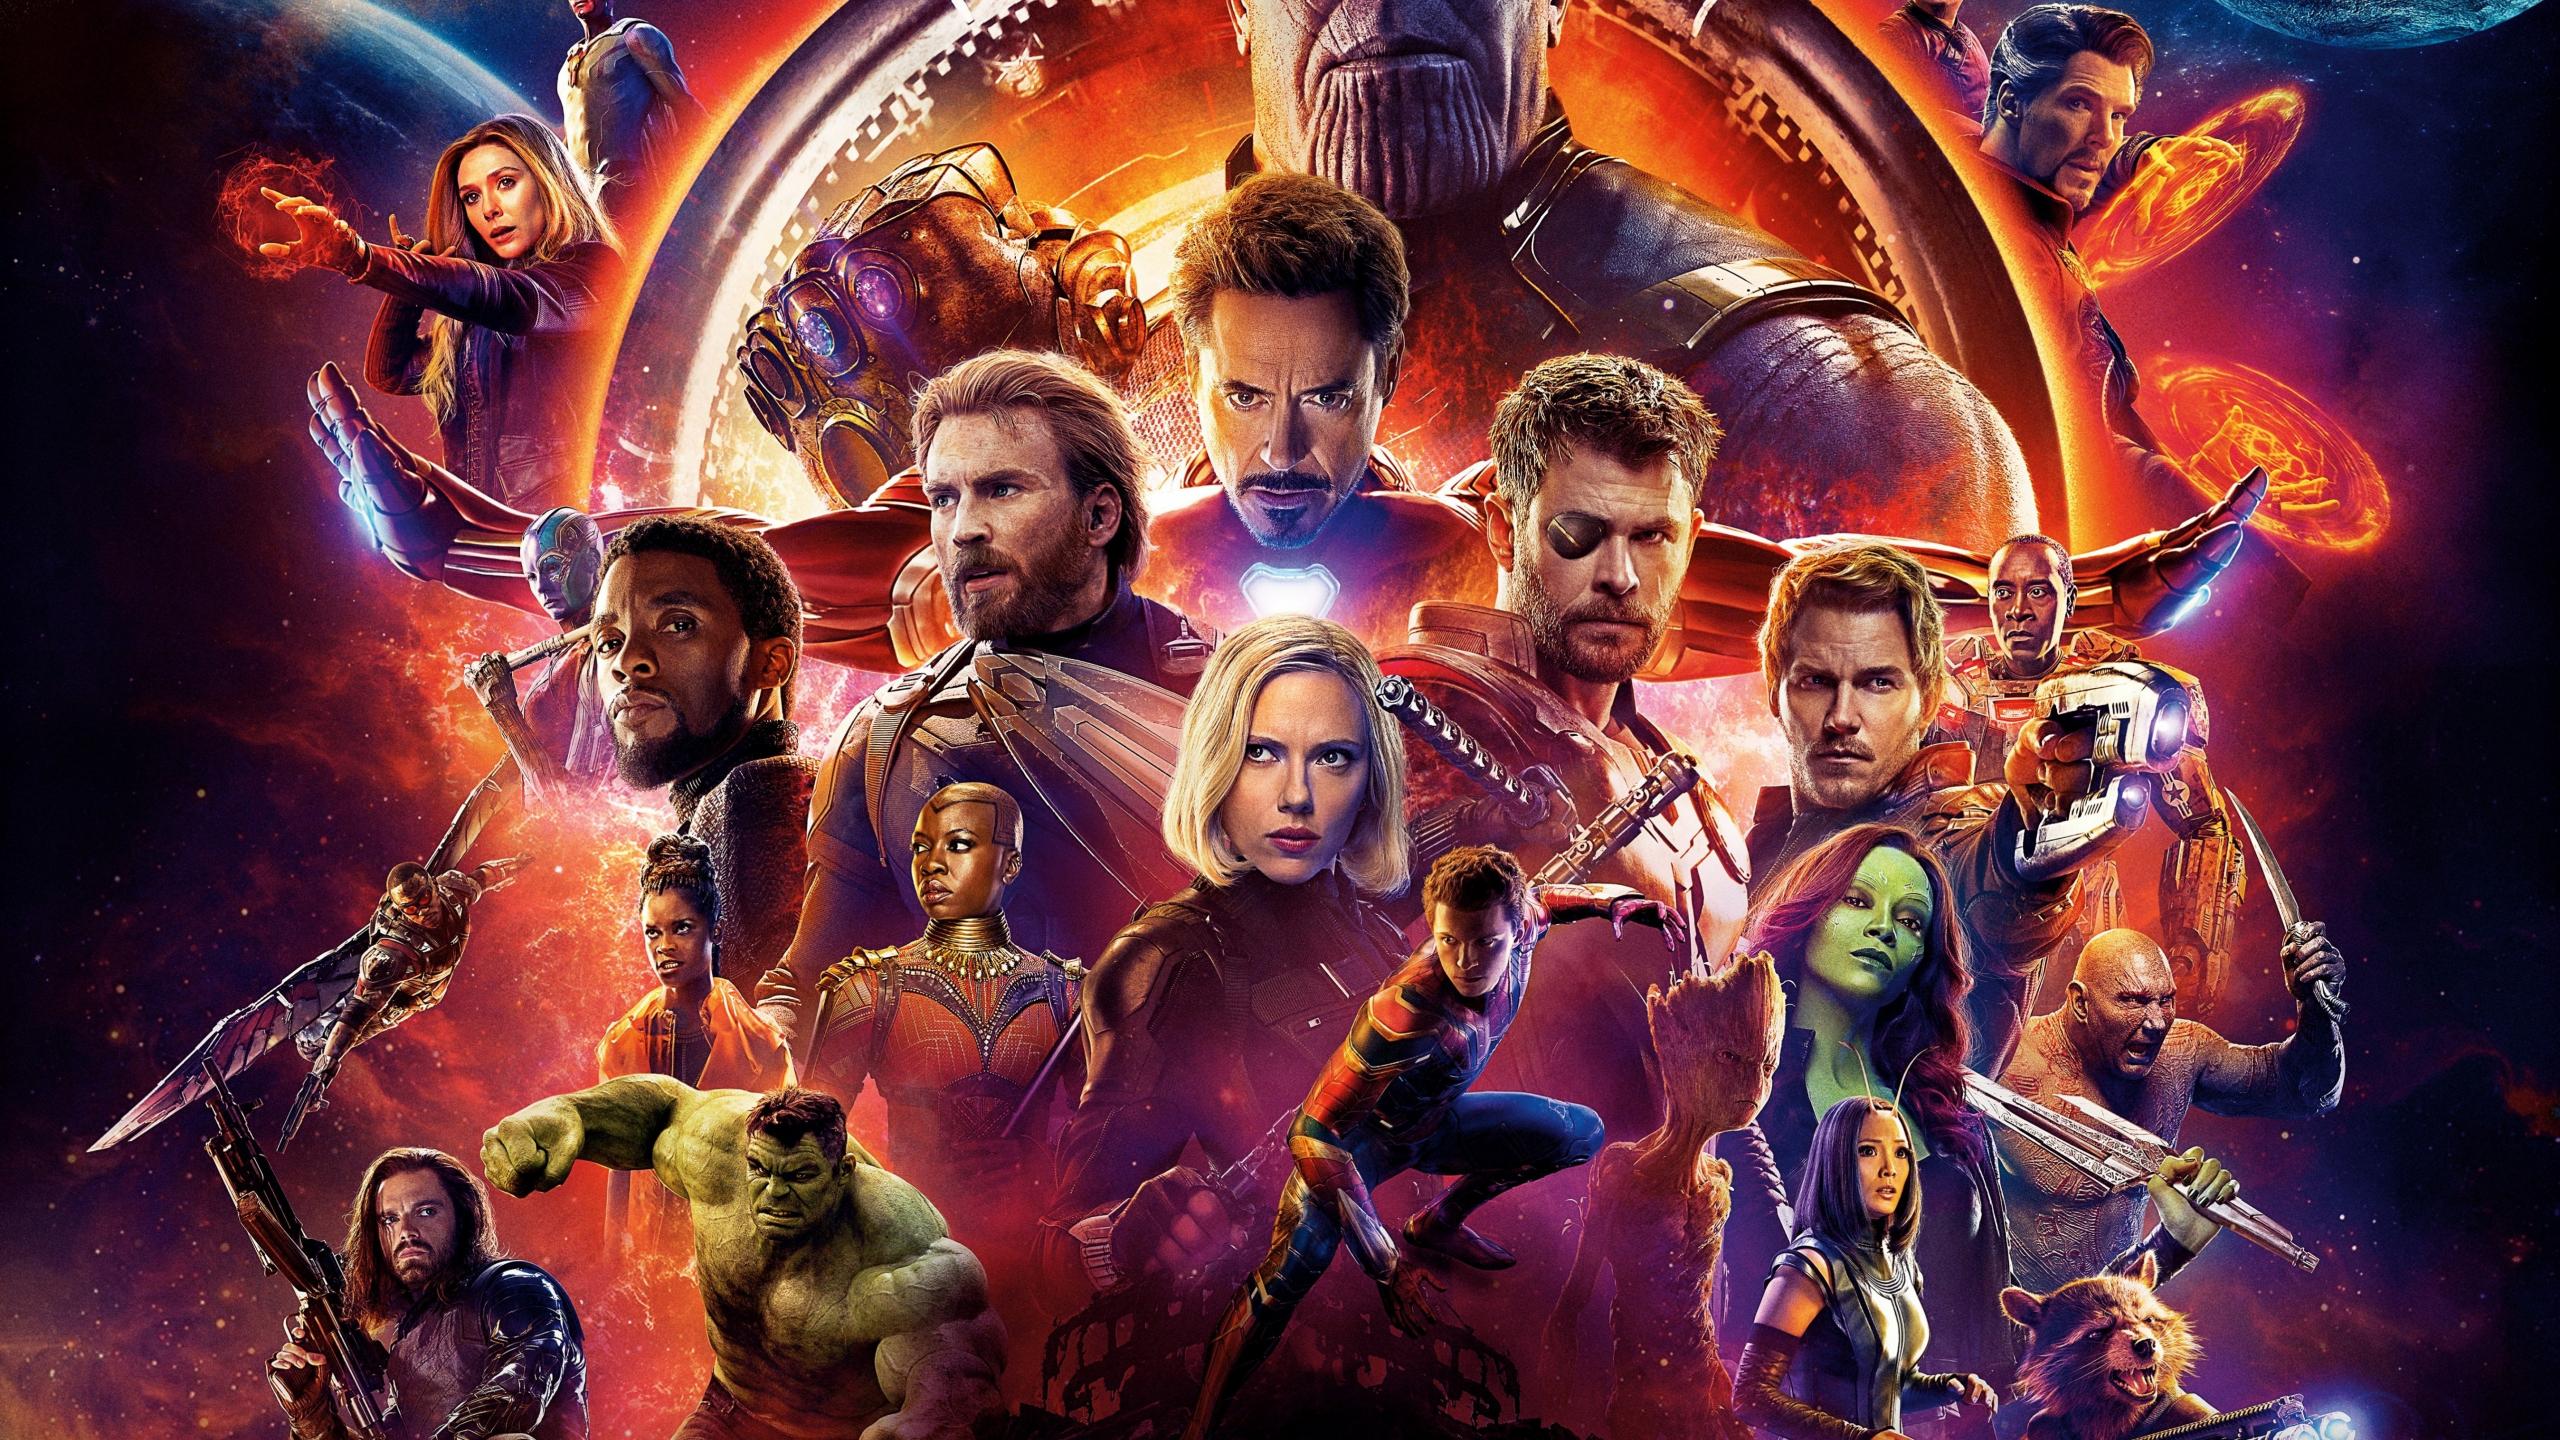 Download 2560x1440 Wallpaper Avengers Infinity War Movie